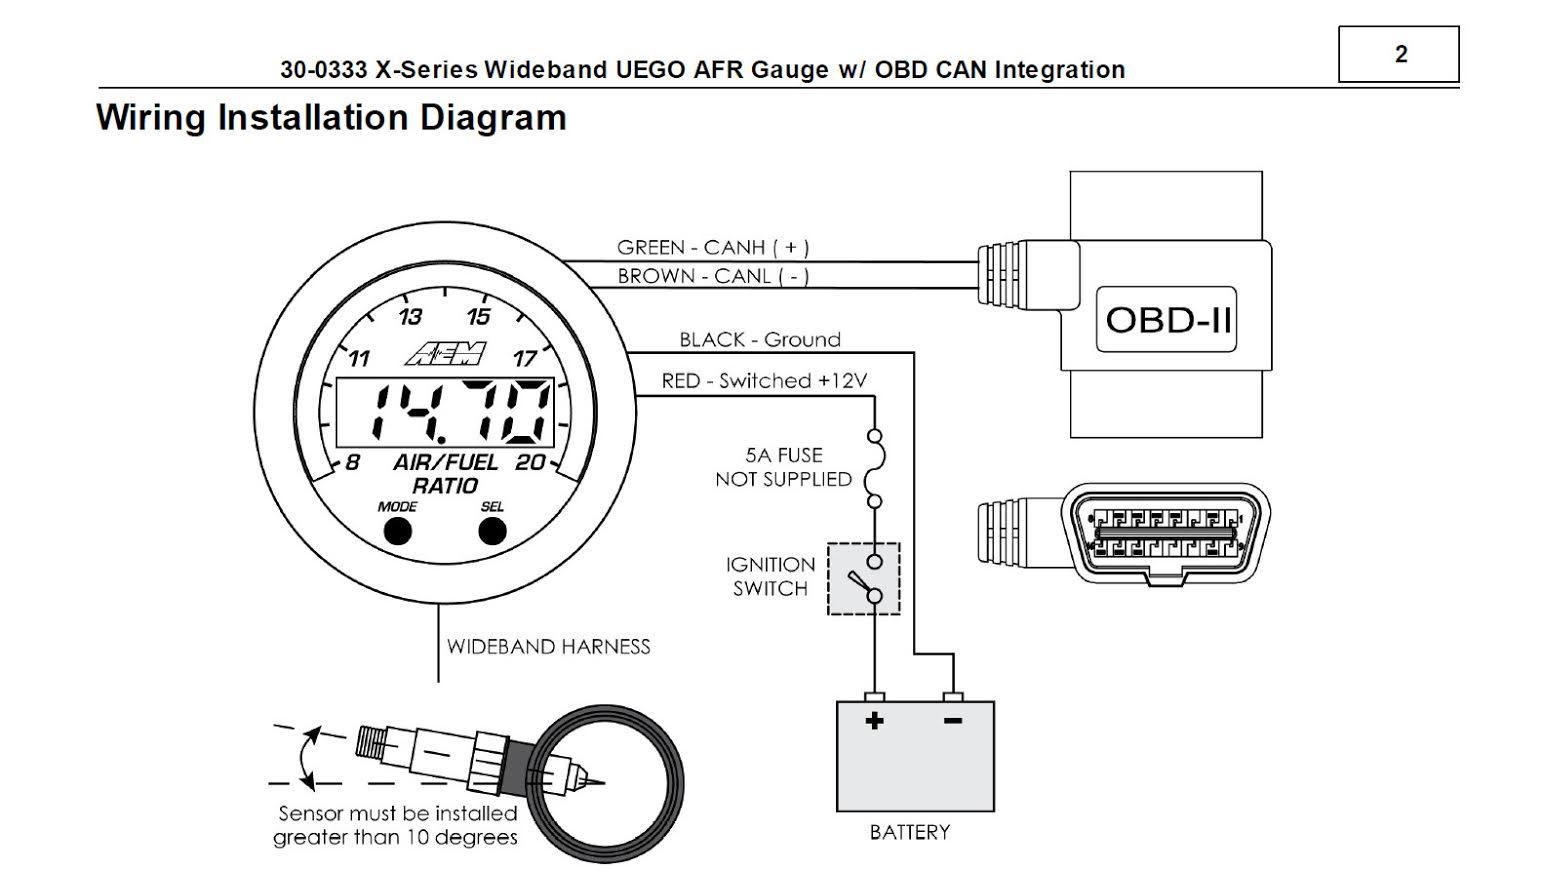 hight resolution of aem wideband wiring diagram electrical schematic wiring diagram aem wideband wiring diagram for 2001 miata aem